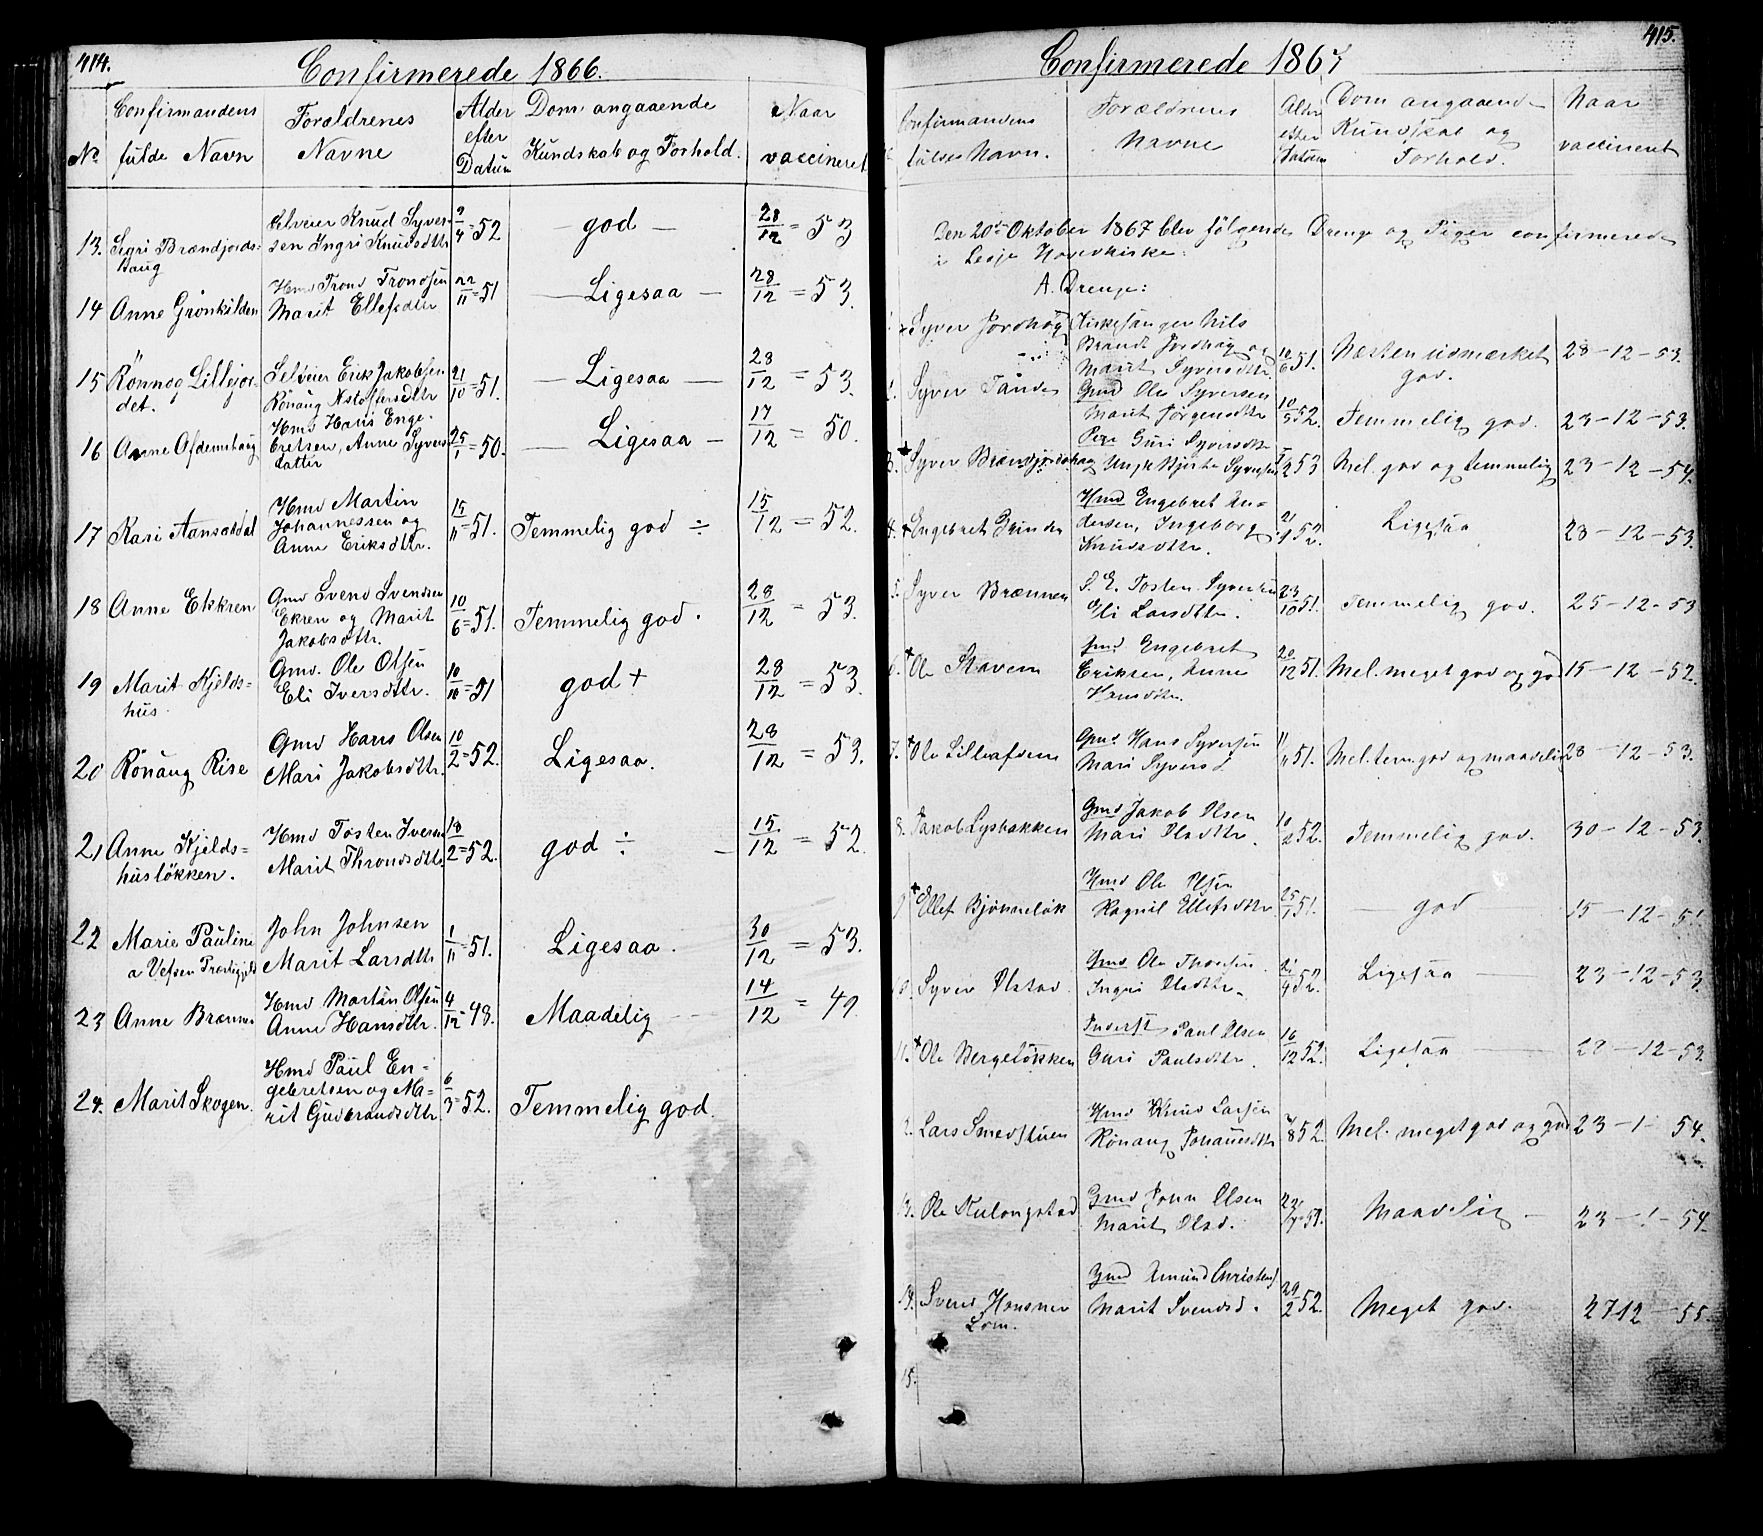 SAH, Lesja prestekontor, Klokkerbok nr. 5, 1850-1894, s. 414-415